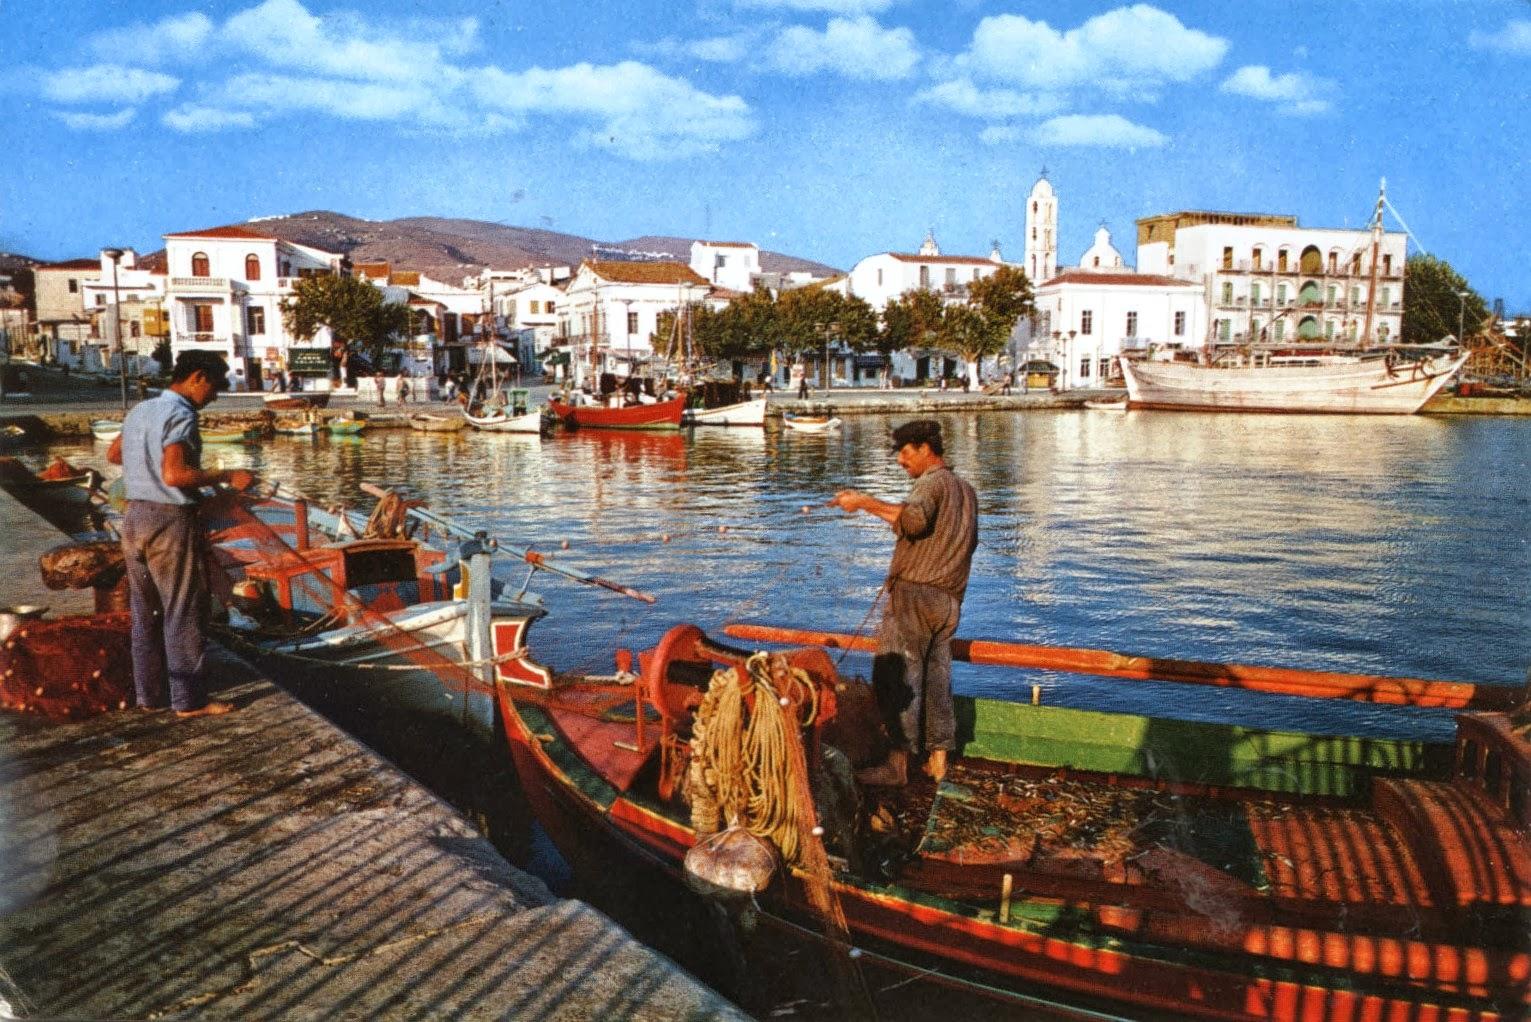 perierga.gr - 18 φωτογραφίες ελληνικών νησιών απ' τα παλιά!